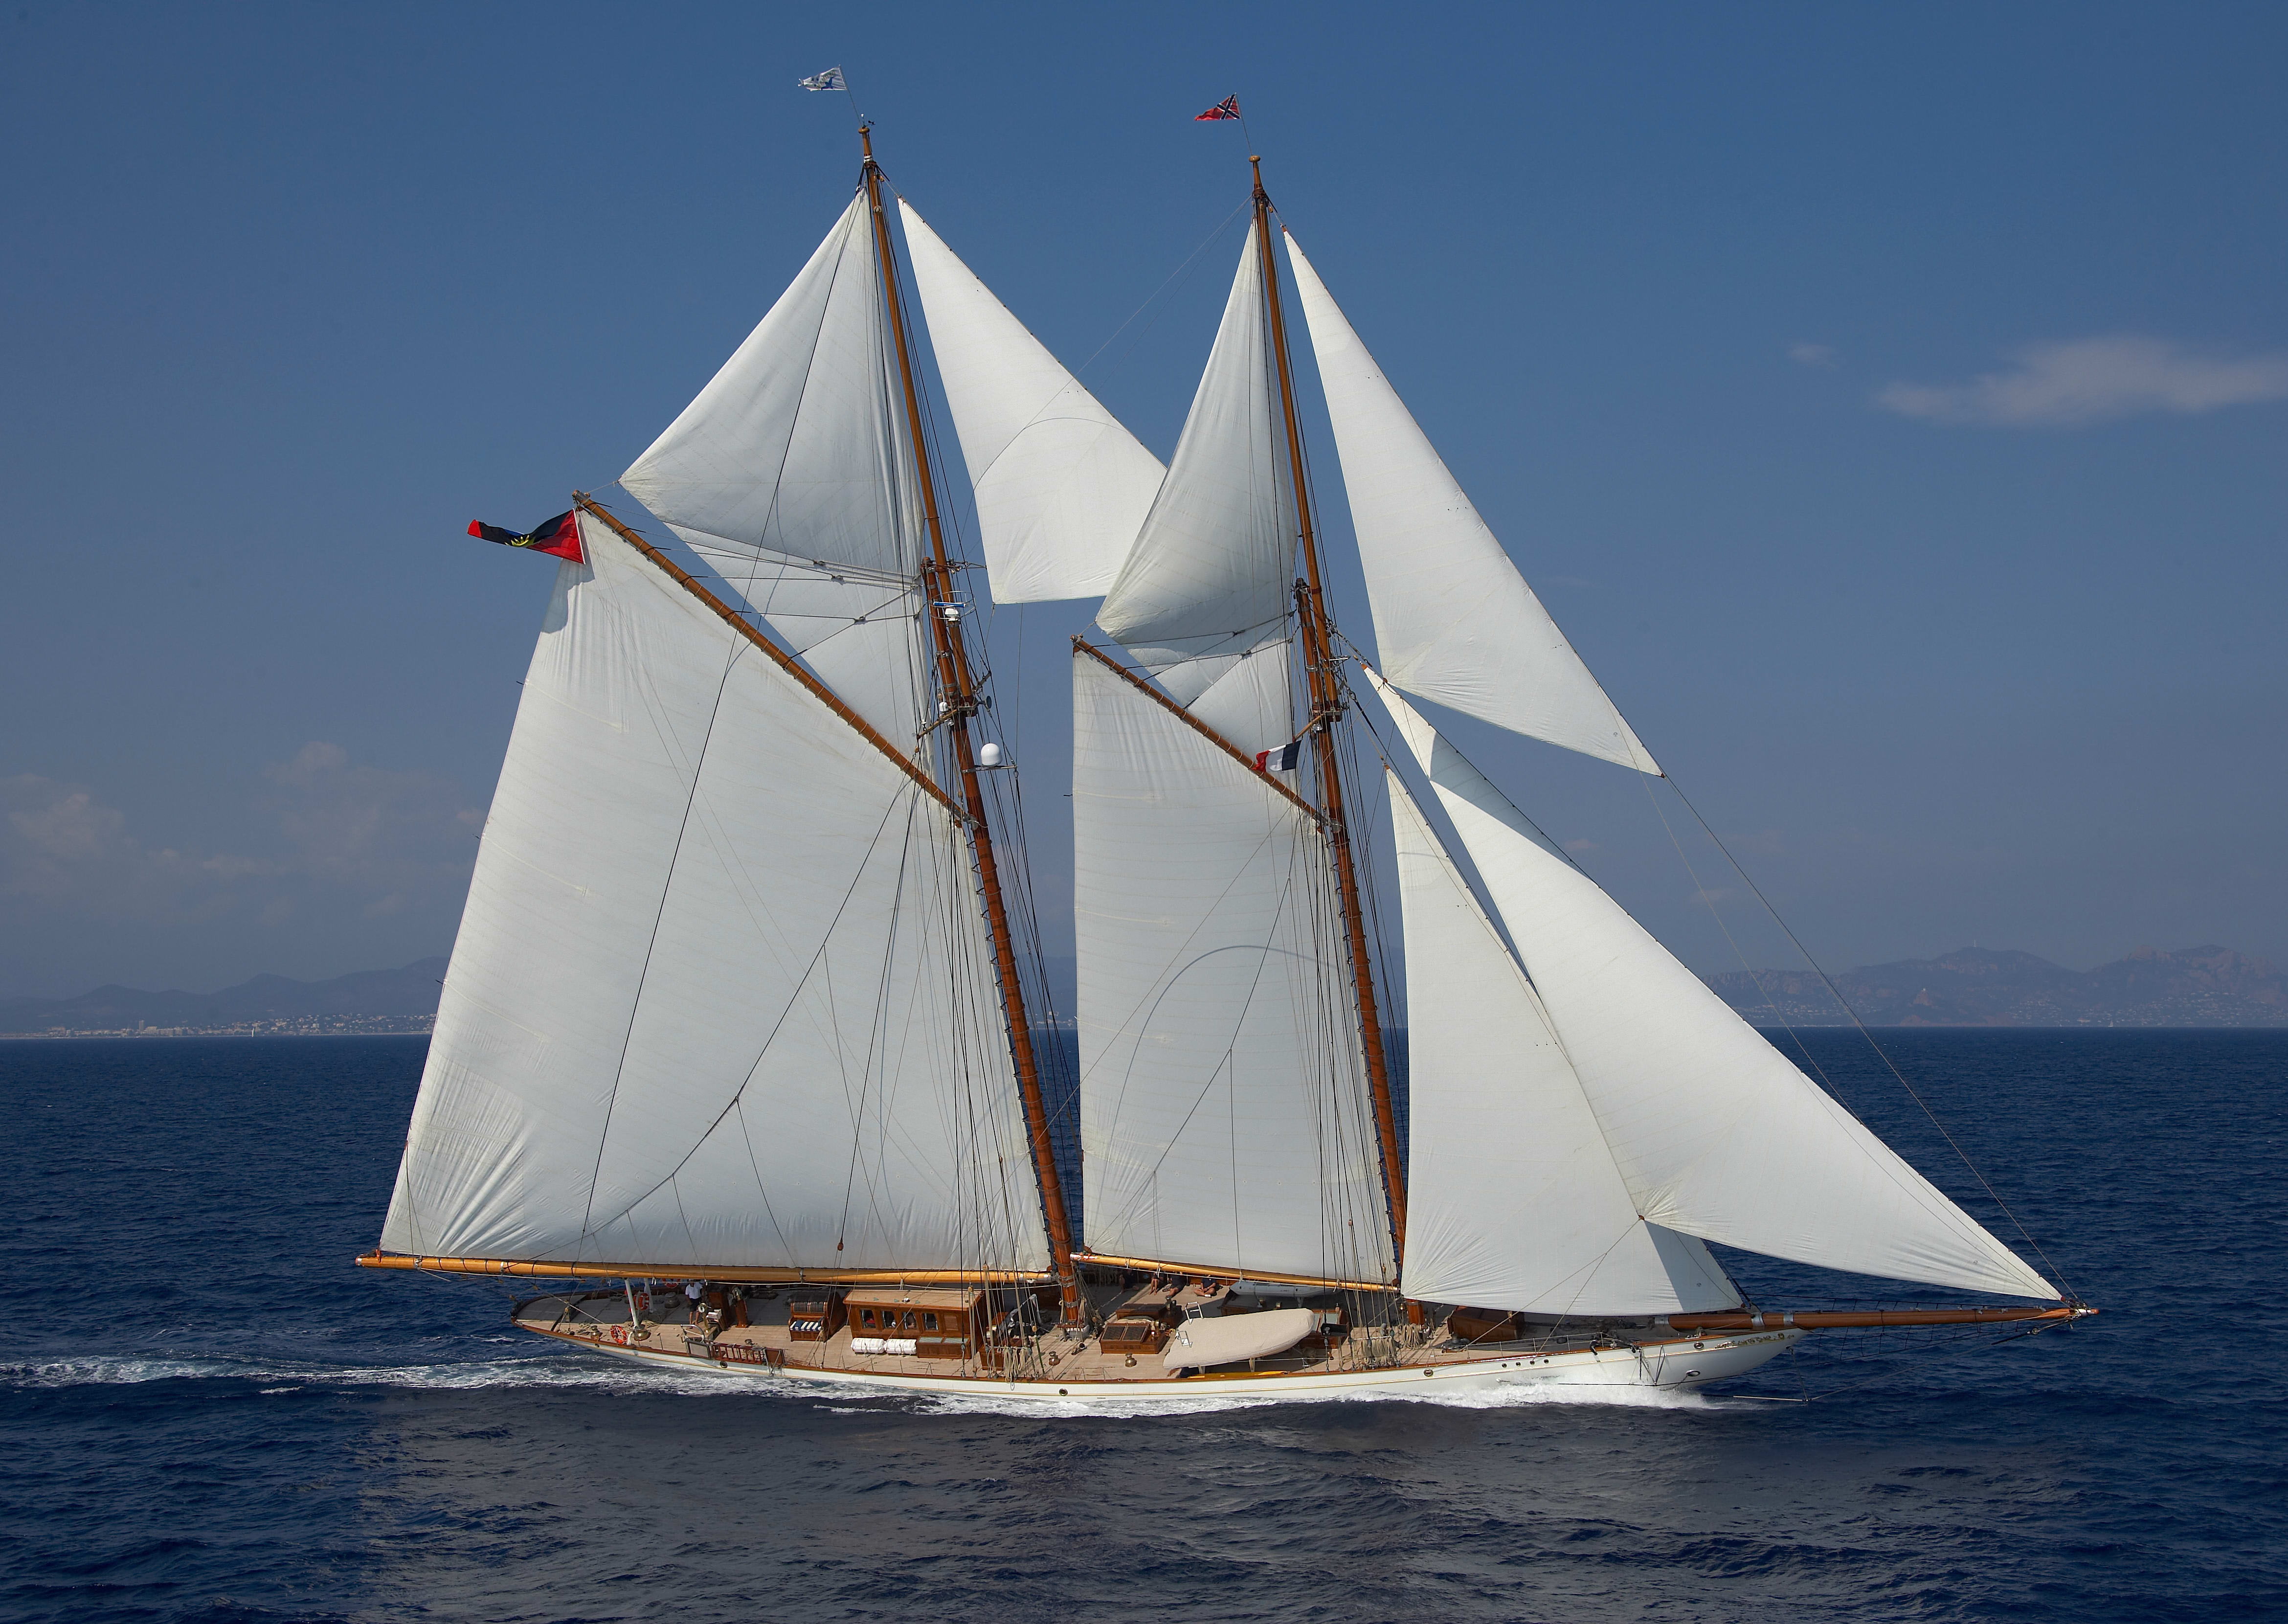 Image of Germania Nova 59.8M (196.2FT) sailing yacht